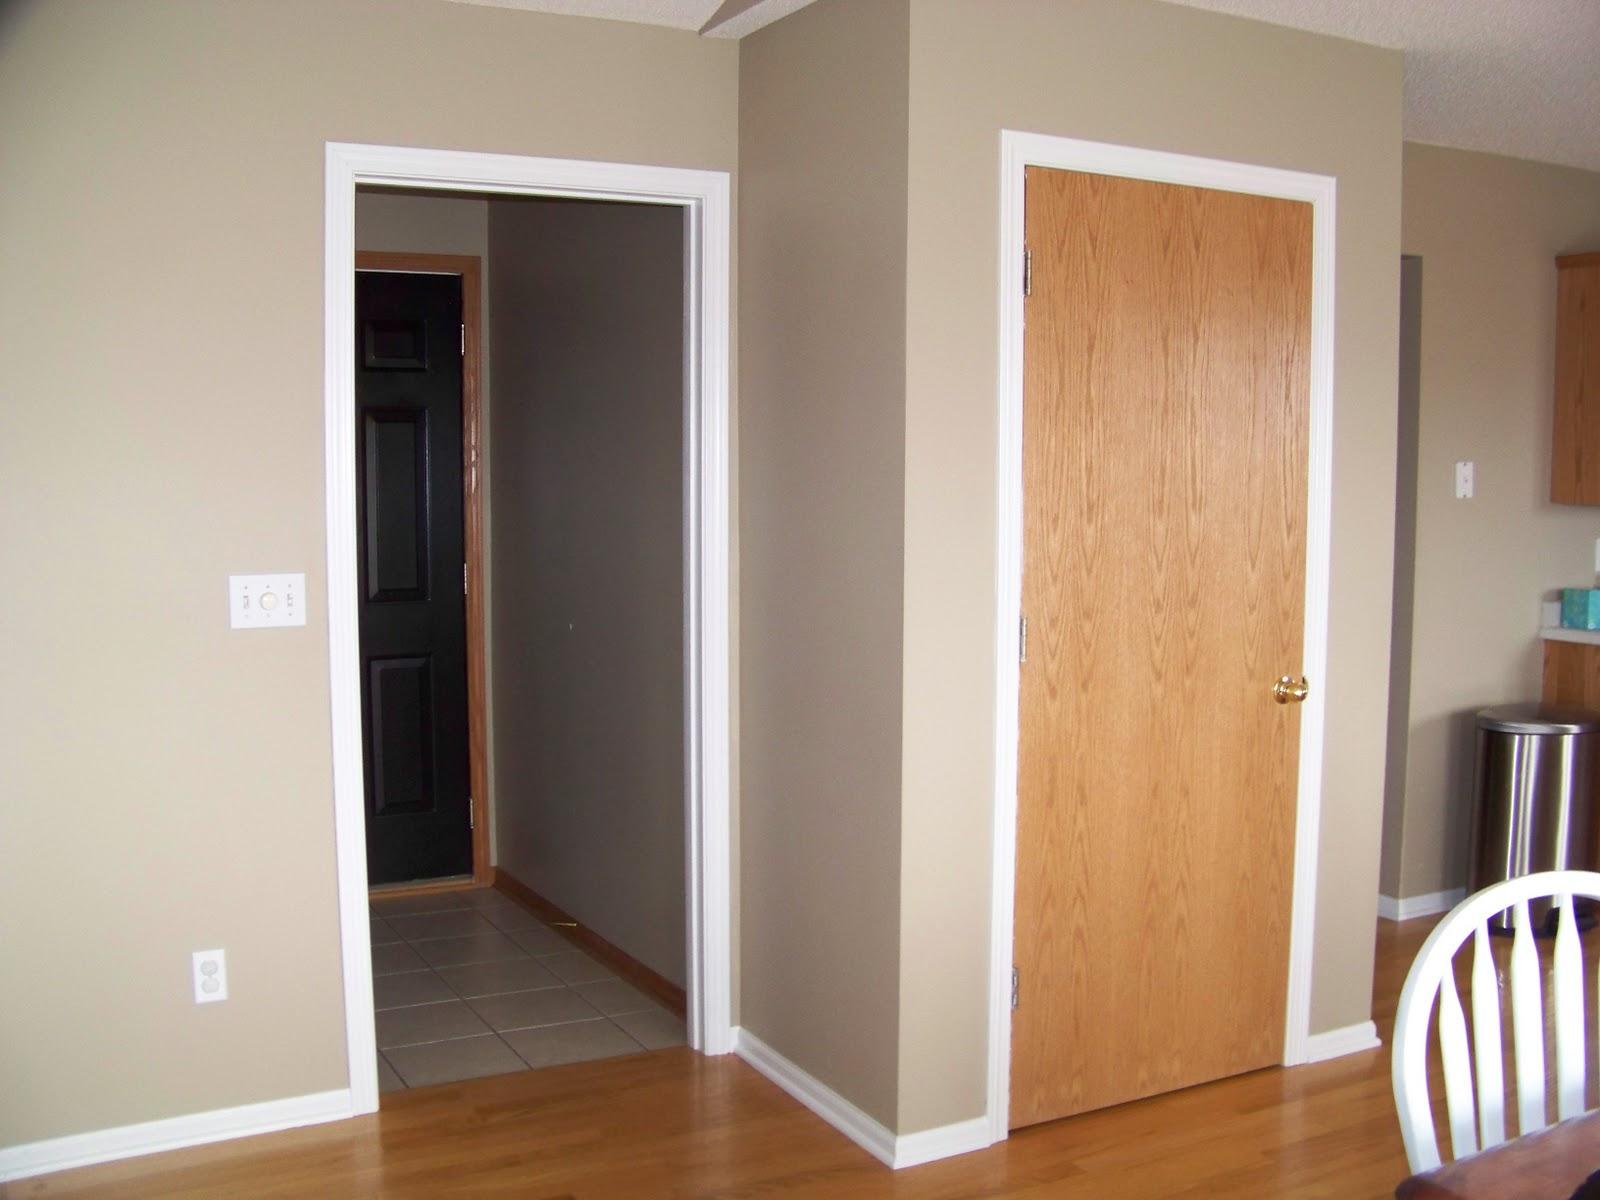 Pictures Of Oak Doors White Trim